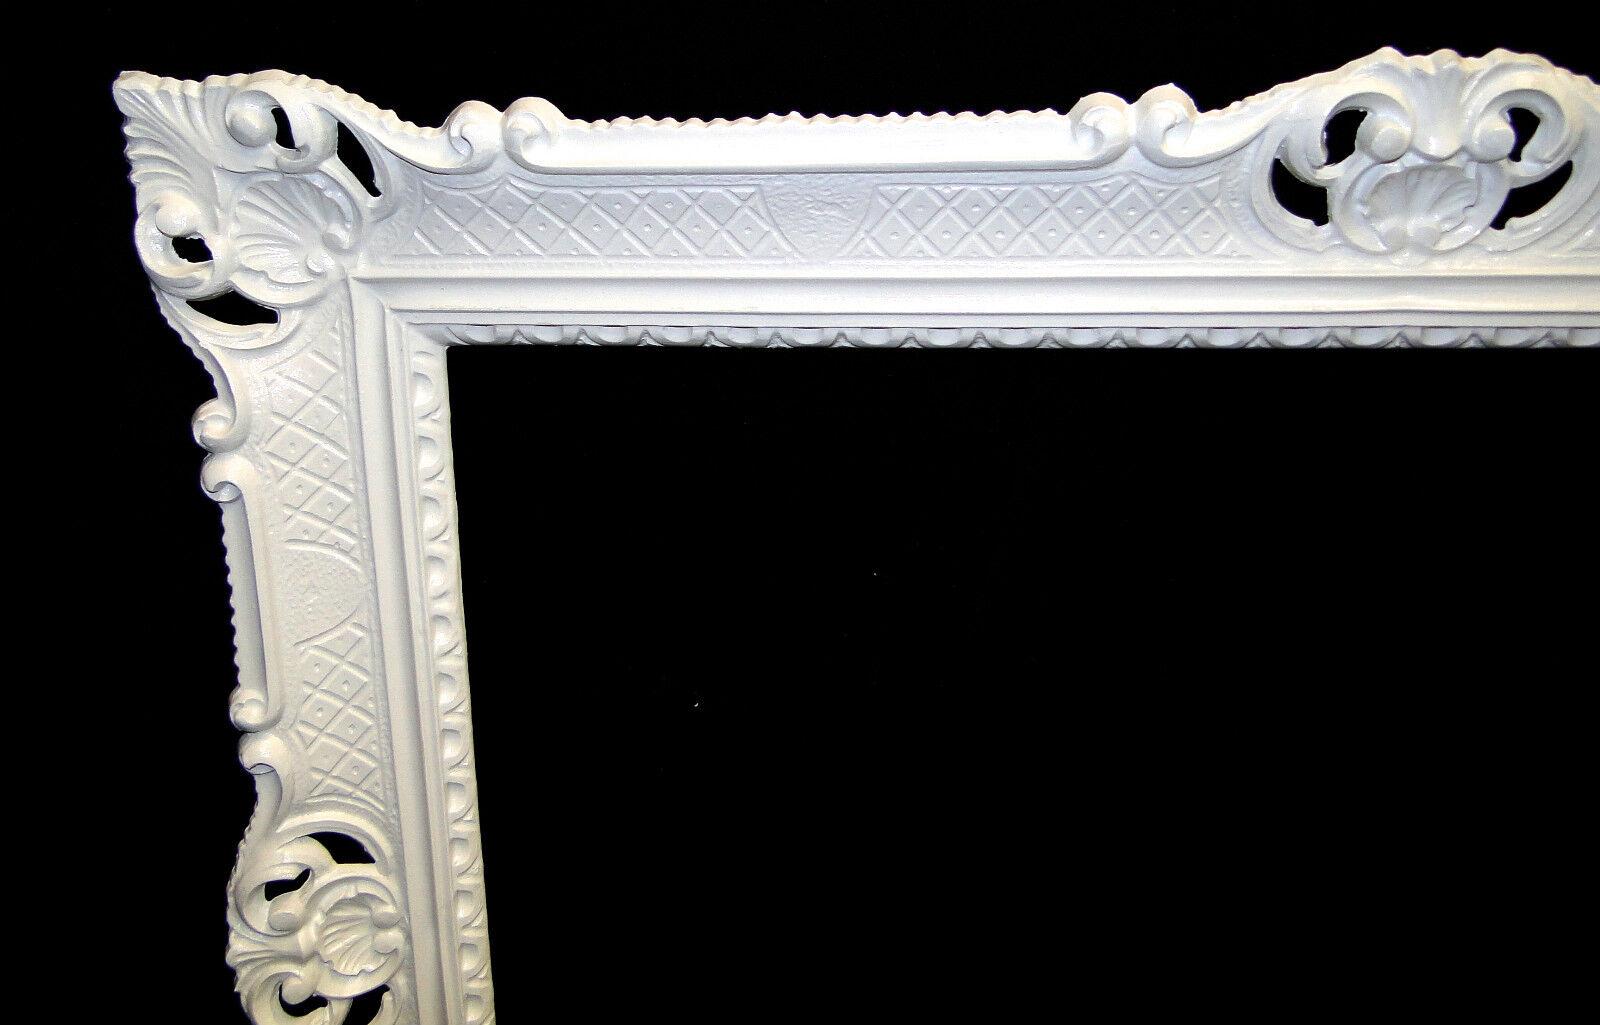 bilderrahmen barock 70x90 bilderrahmen jugendstill antik. Black Bedroom Furniture Sets. Home Design Ideas